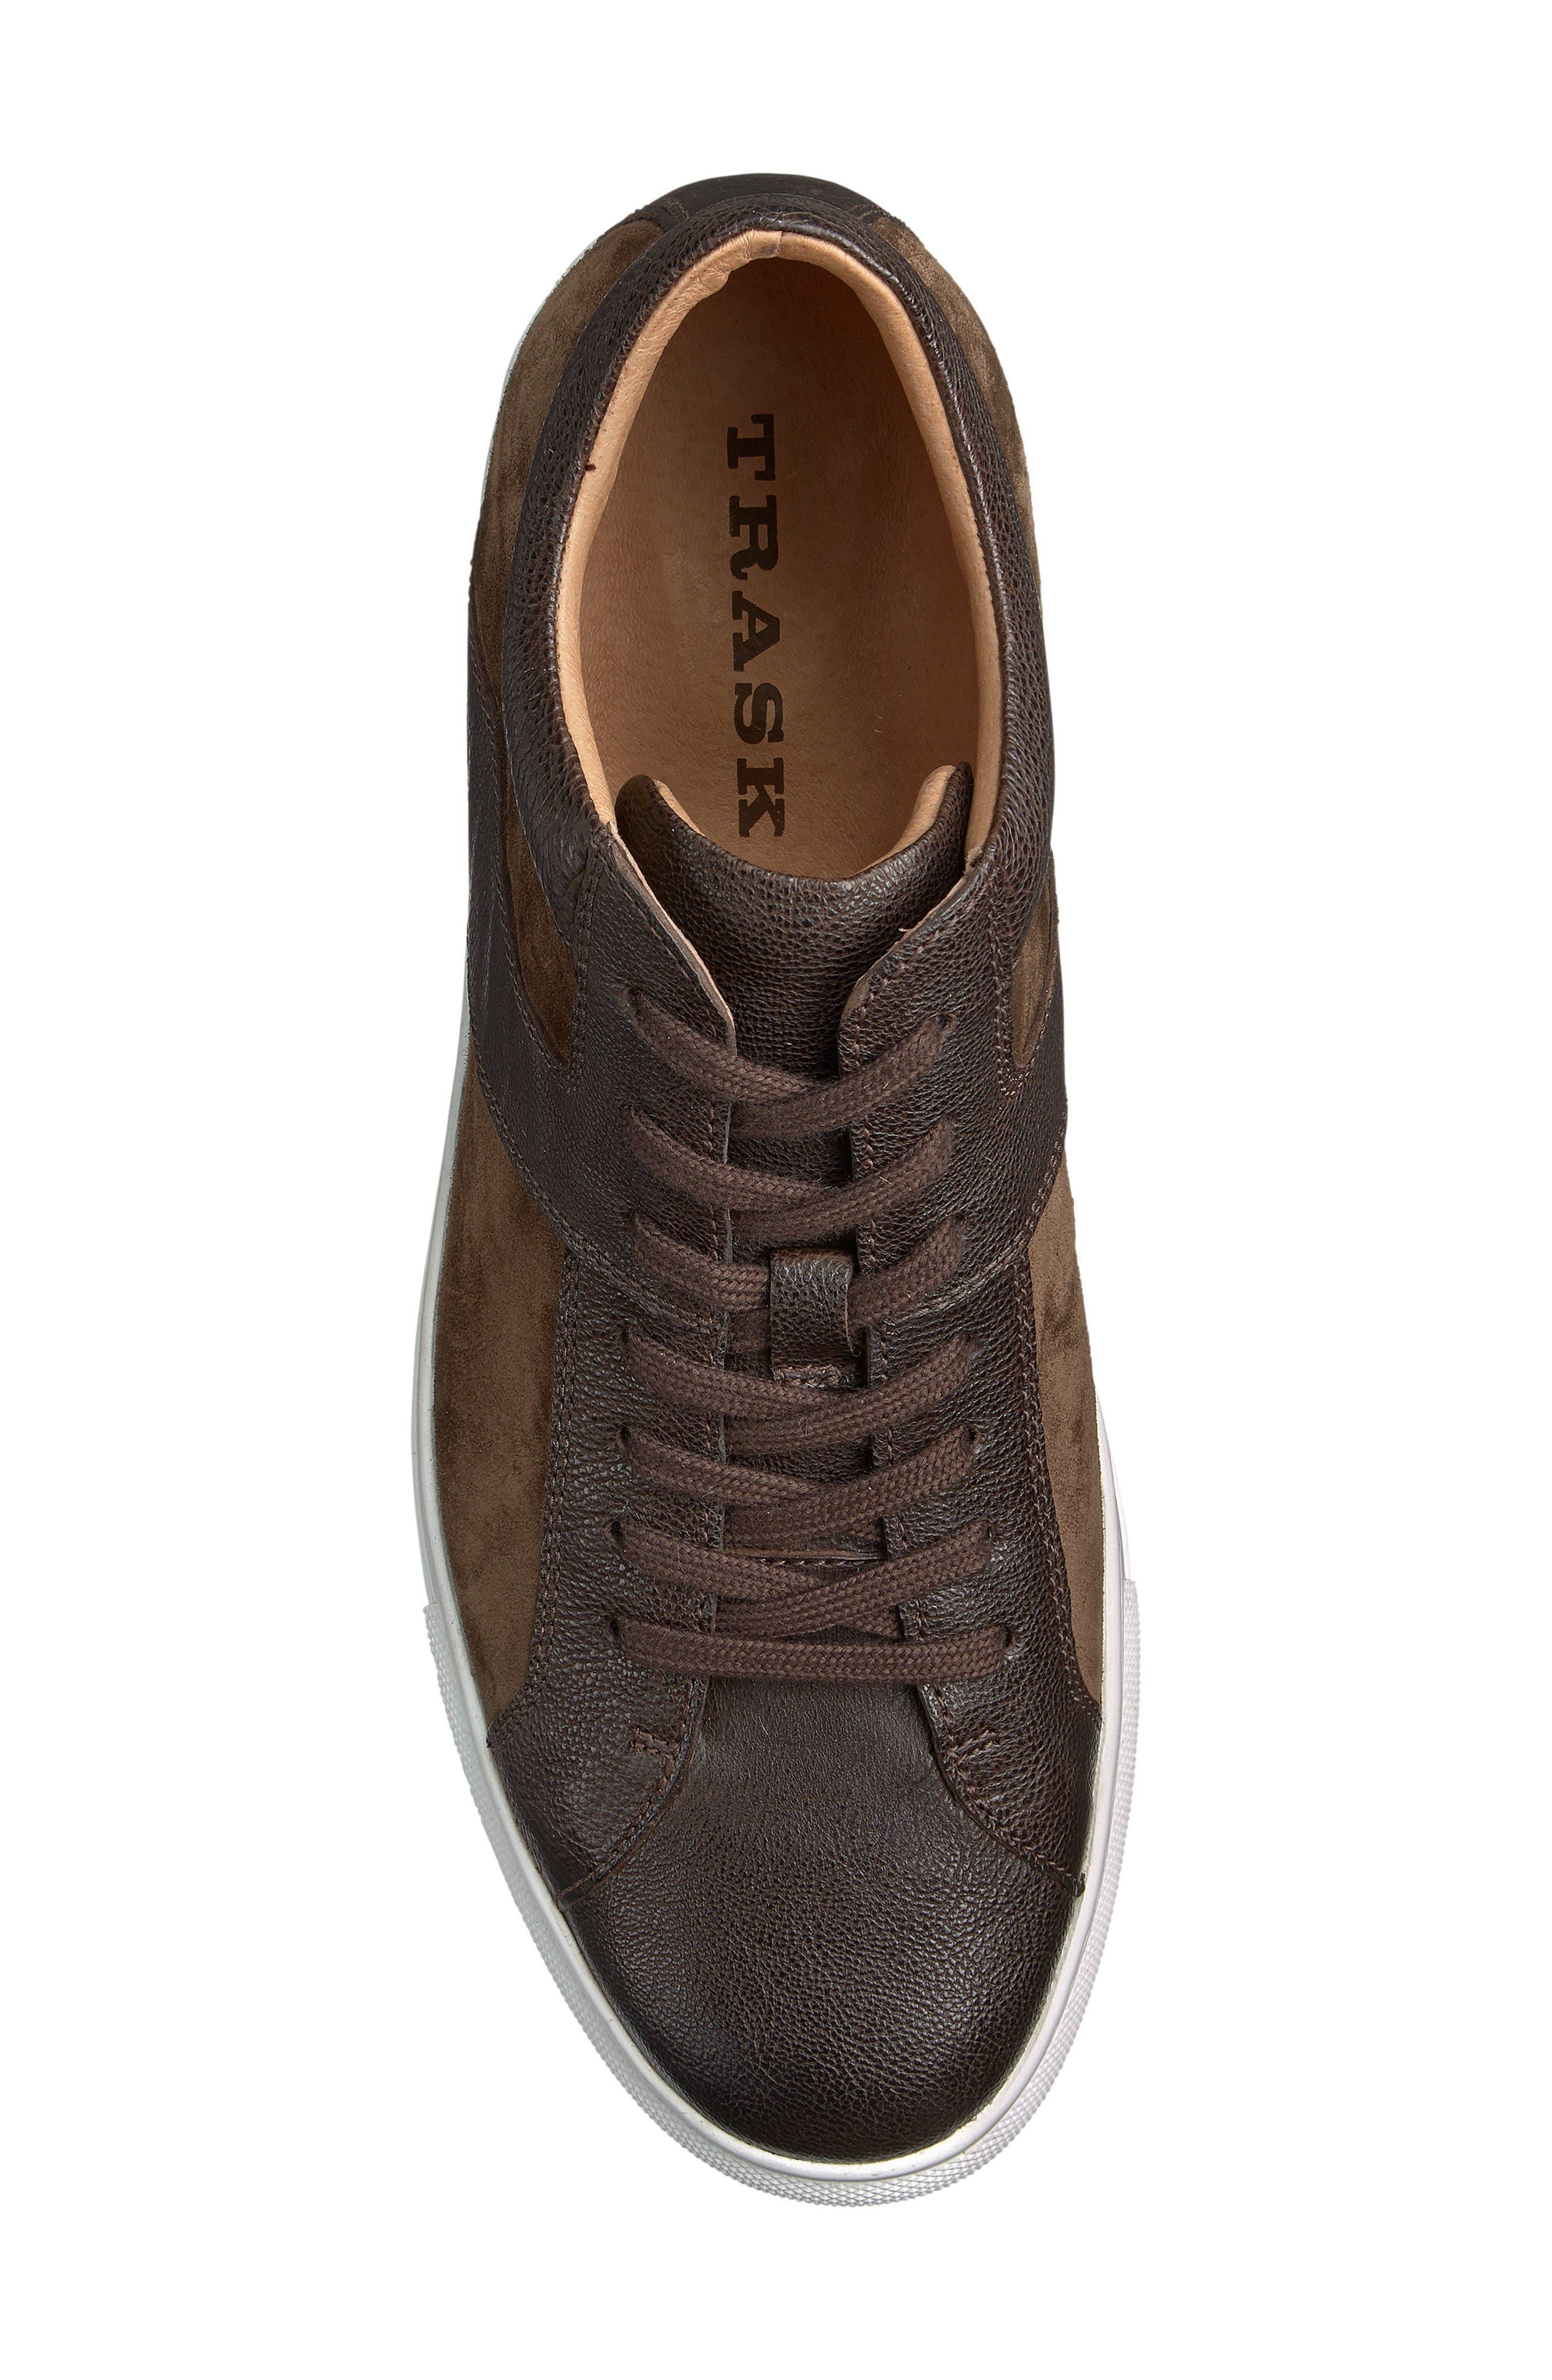 Alec Sneaker,                             Alternate thumbnail 3, color,                             DARK BROWN LEATHER/SUEDE